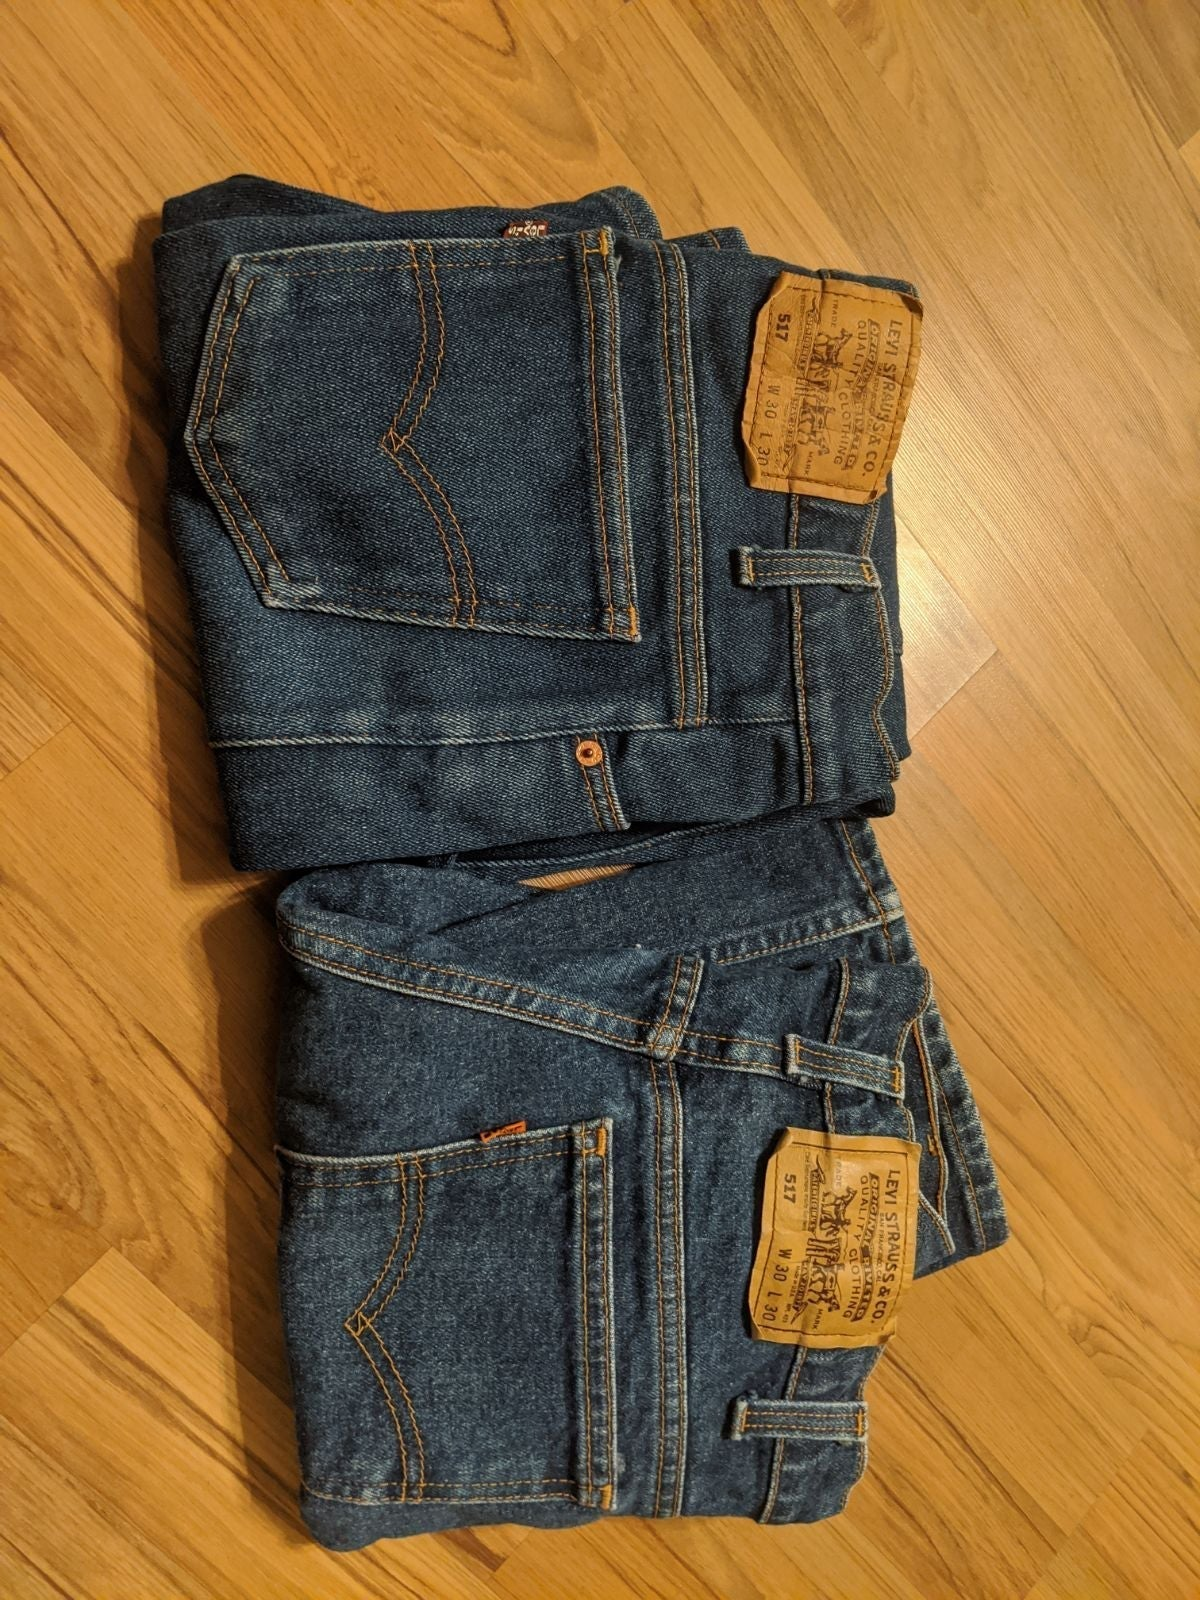 Levi jeans 517 lot of 2, 30x30